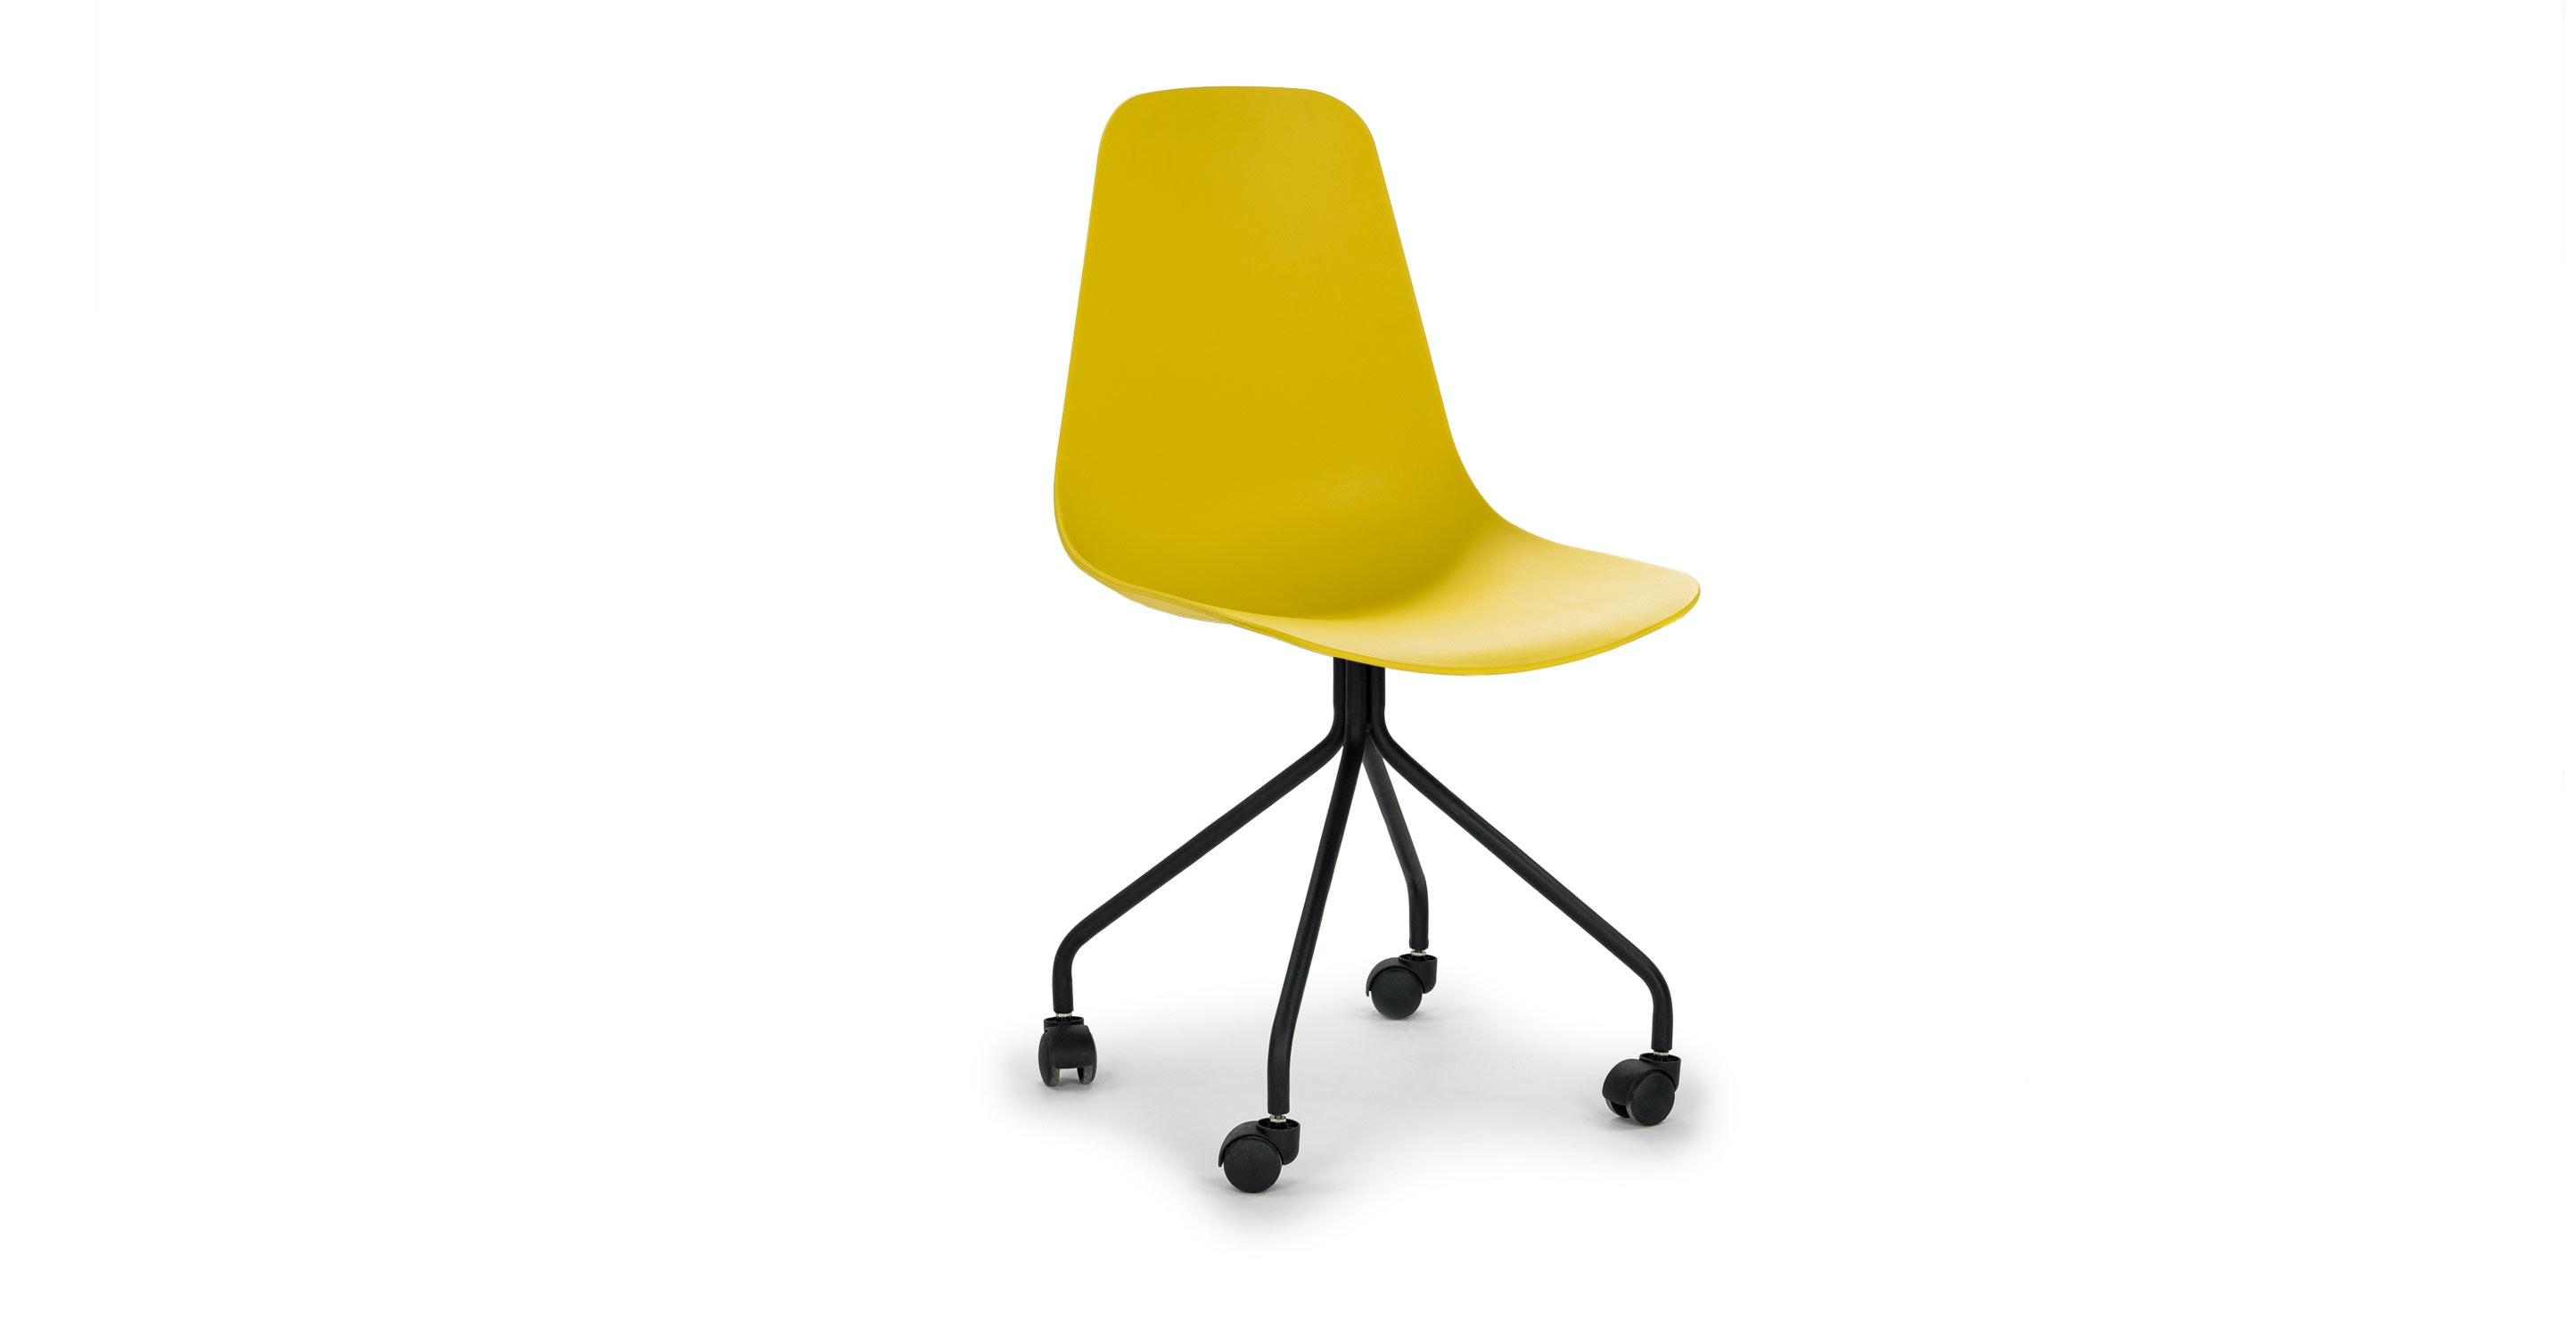 Svelti Daisy Yellow fice Chair Chairs Article